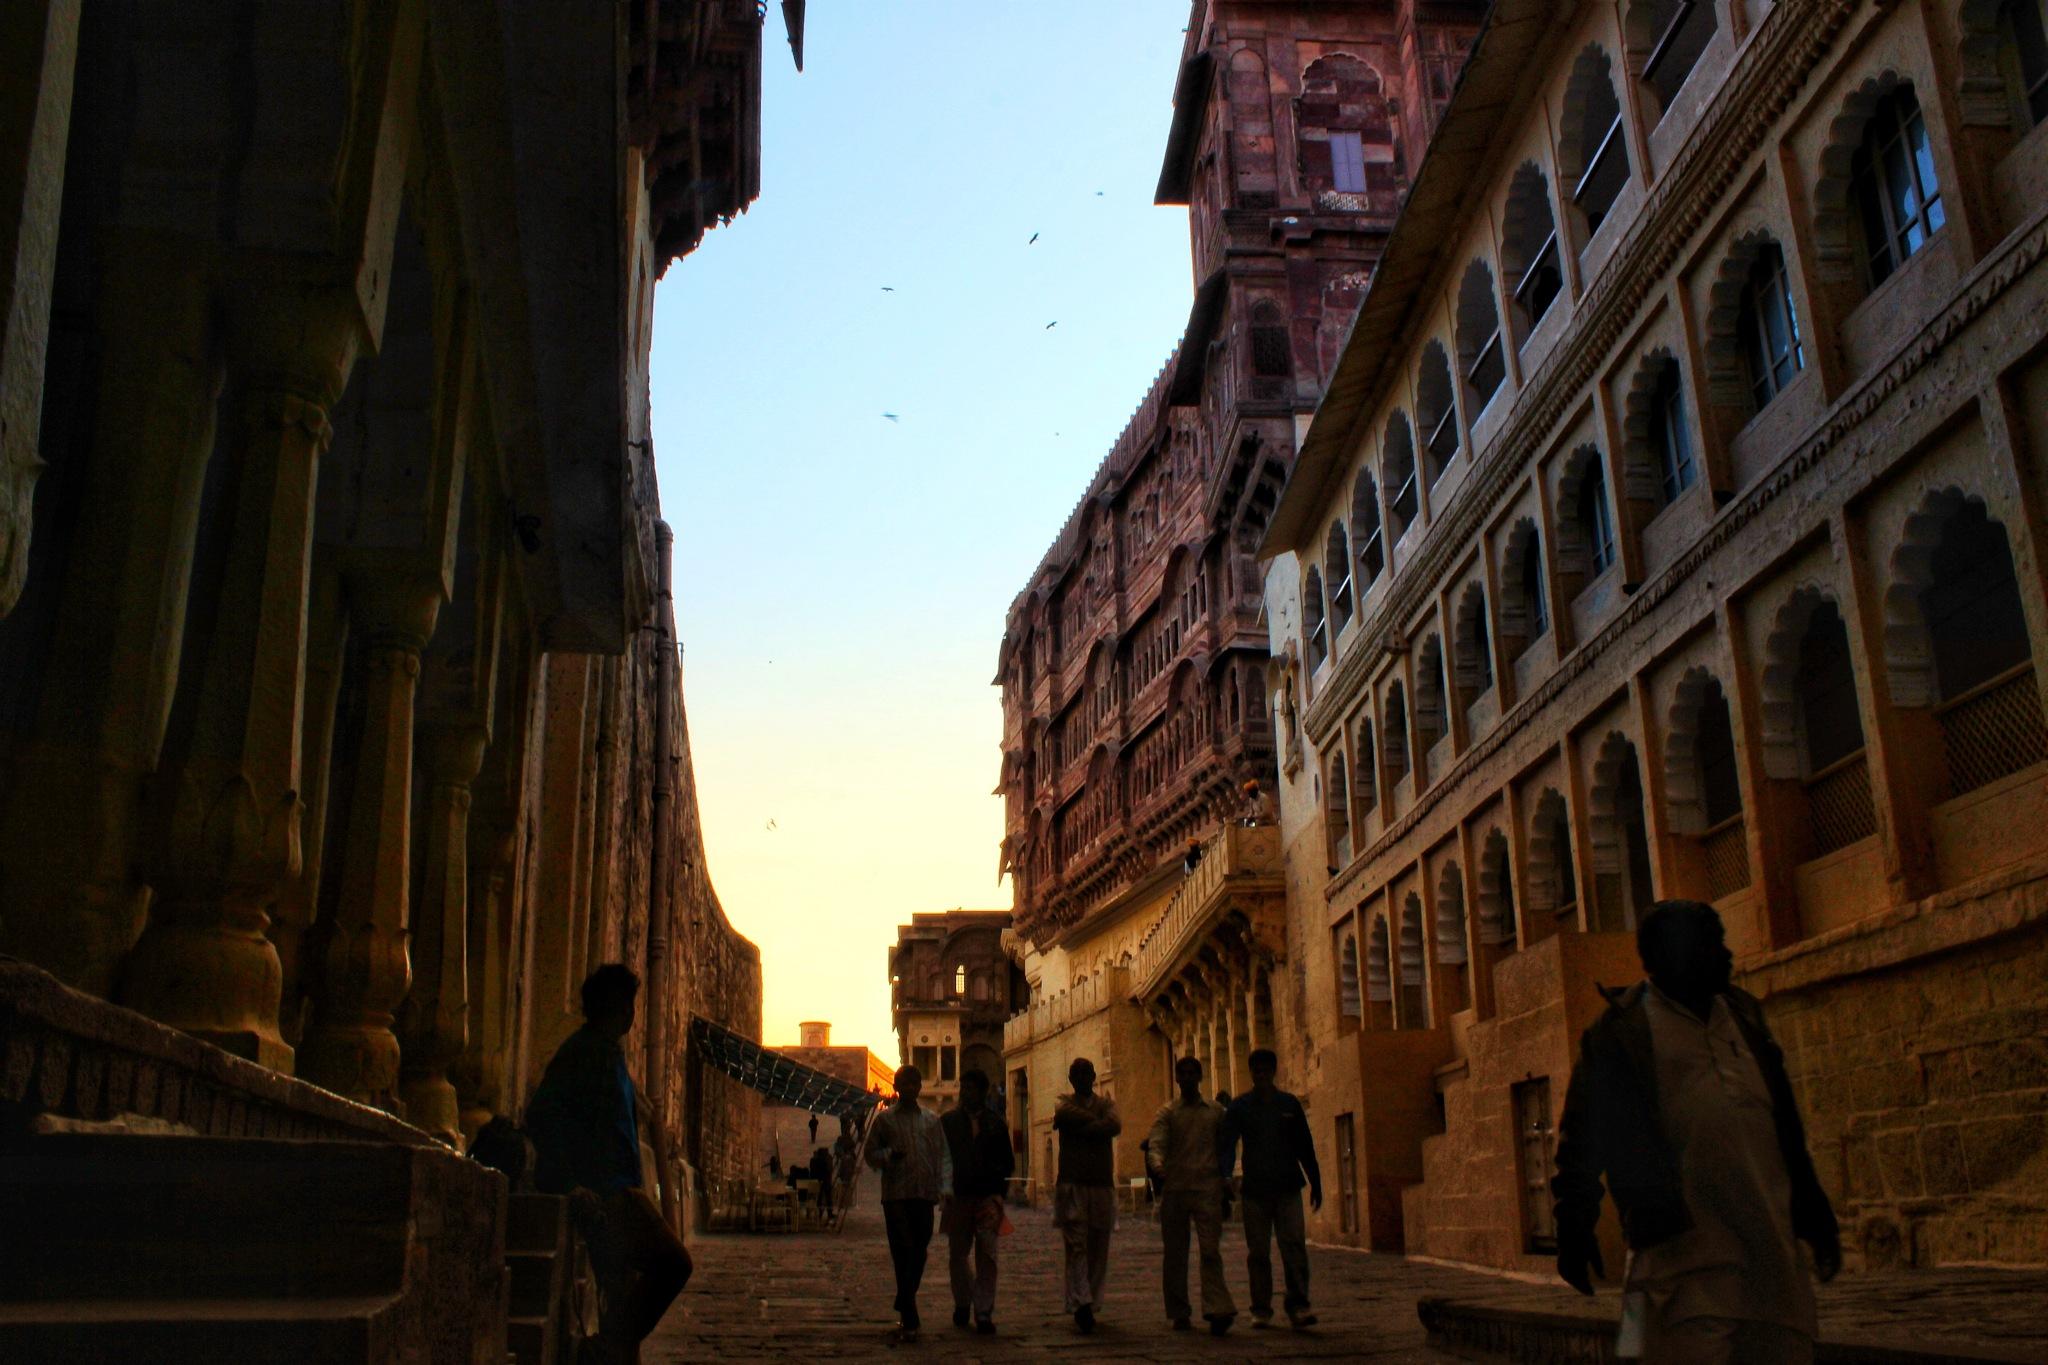 A royal past by Amal Sudharman